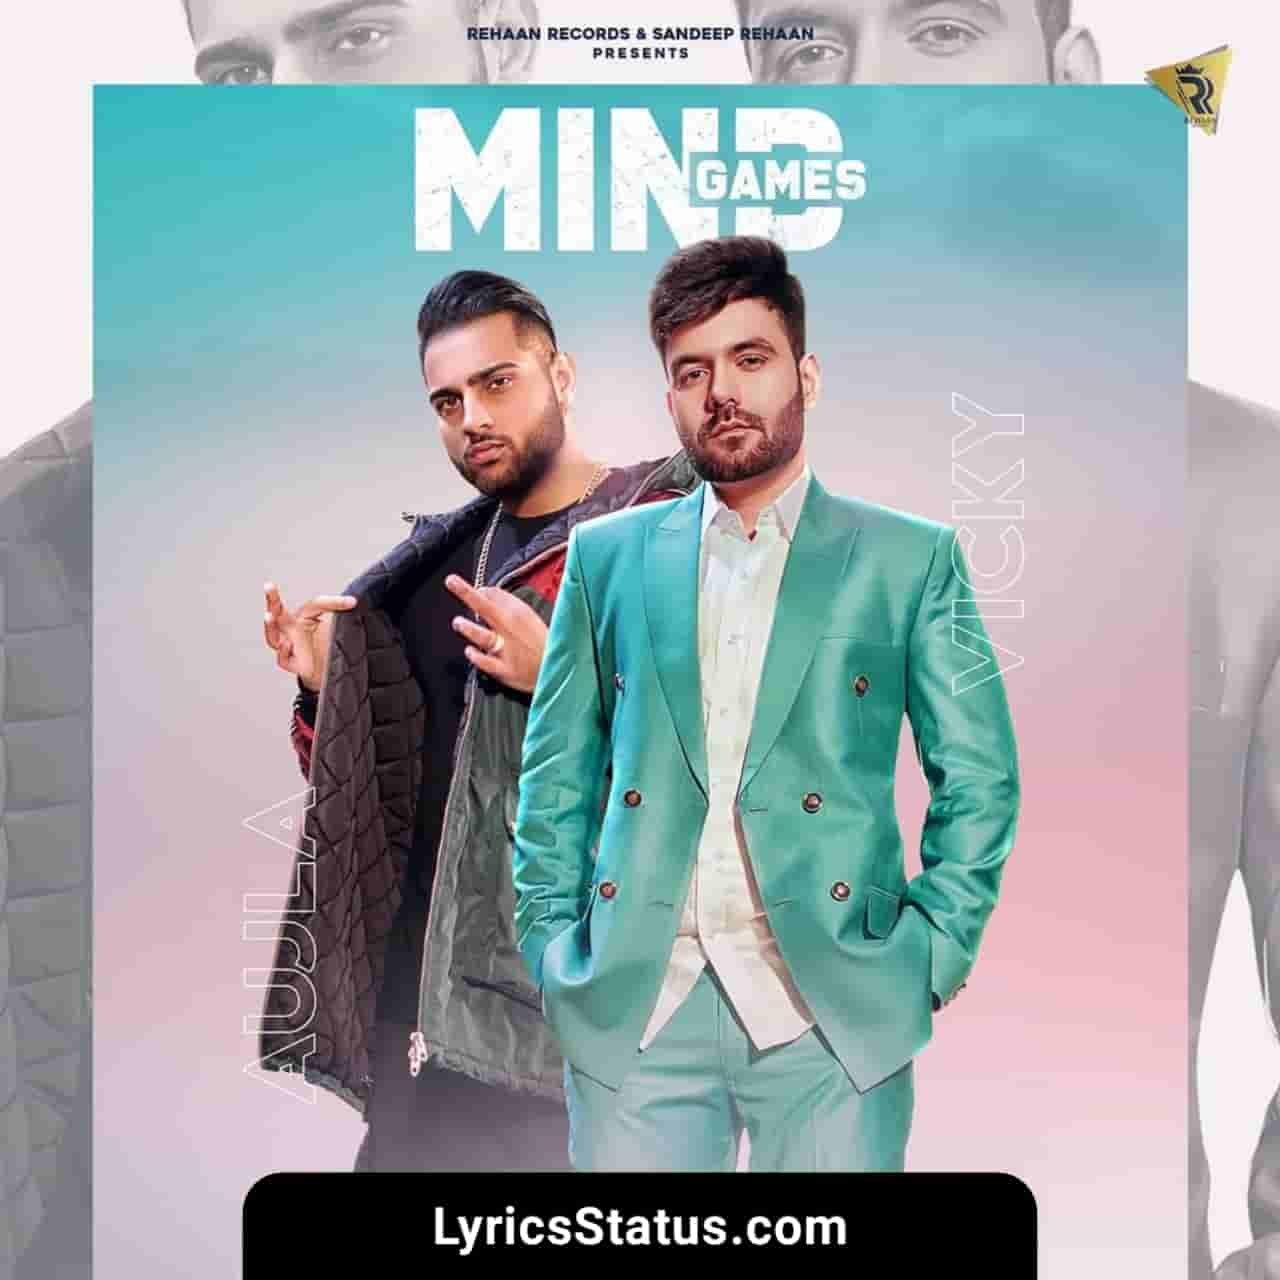 Vicky Mind Games Karan Aujla Lyrics status download punjabi song Main taan dil de naal dil firda si laun nu Tu taan dil te dimag la gayi black status